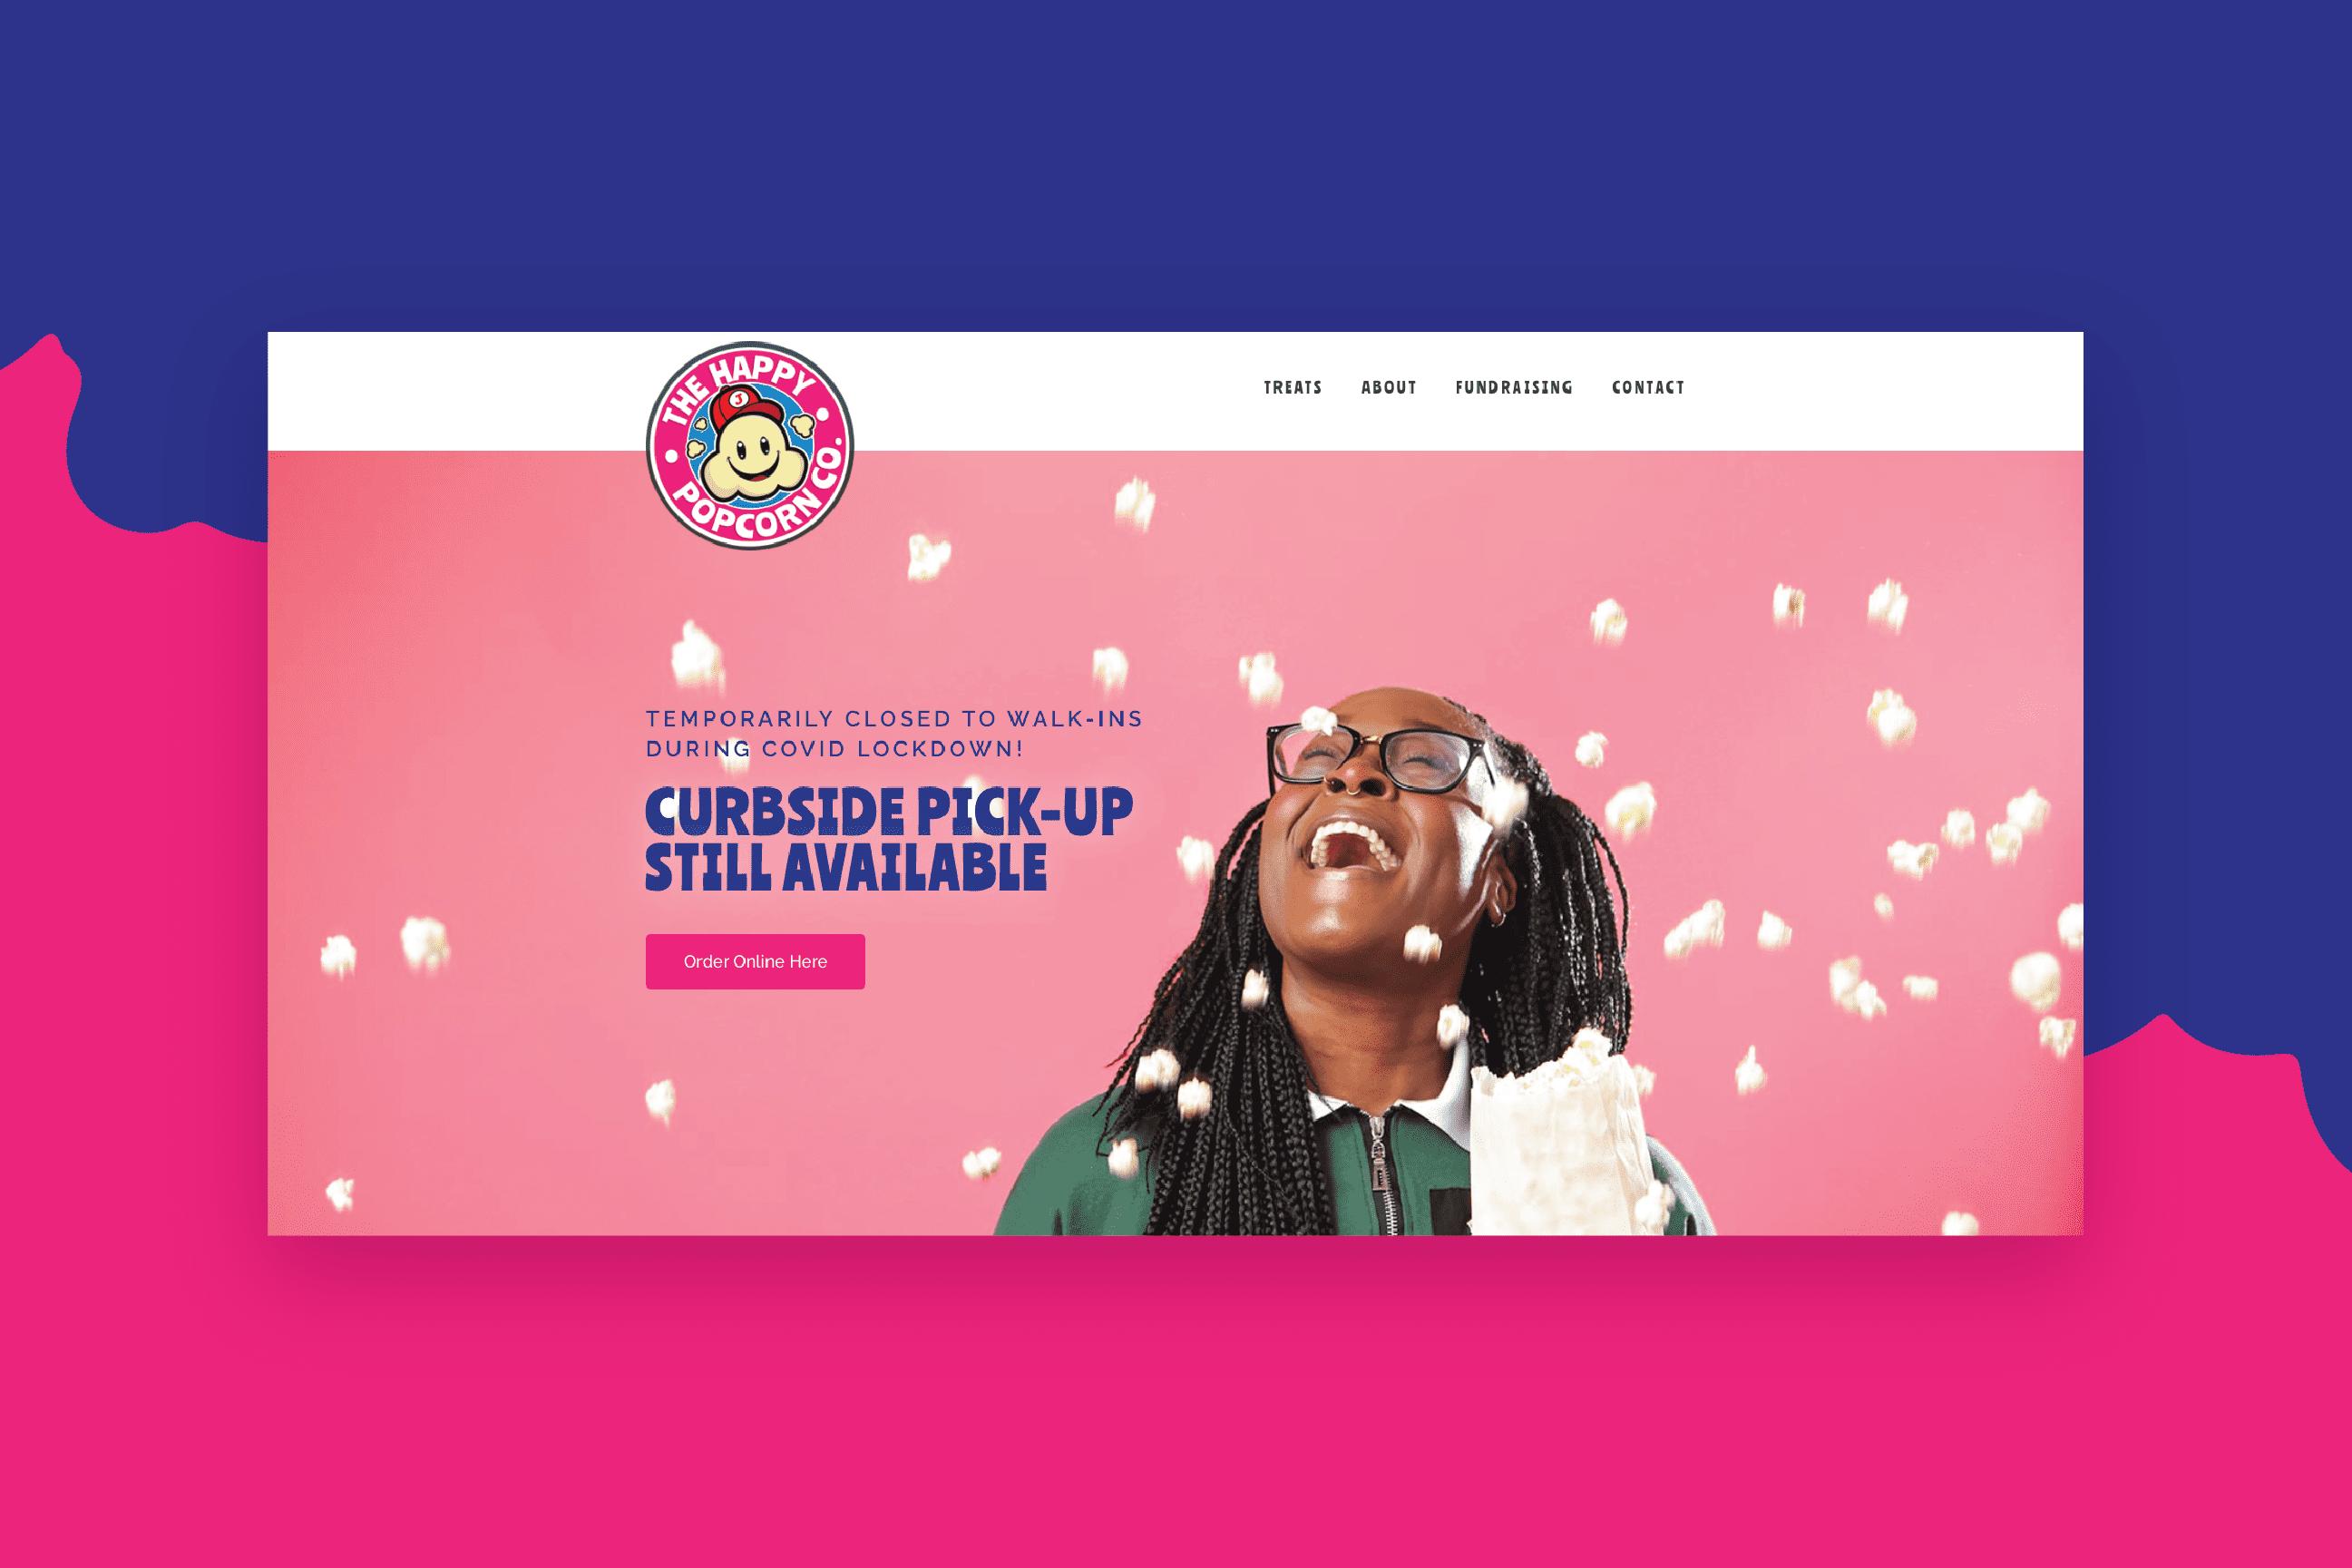 Hero section of The Happy Popcorn Co. website